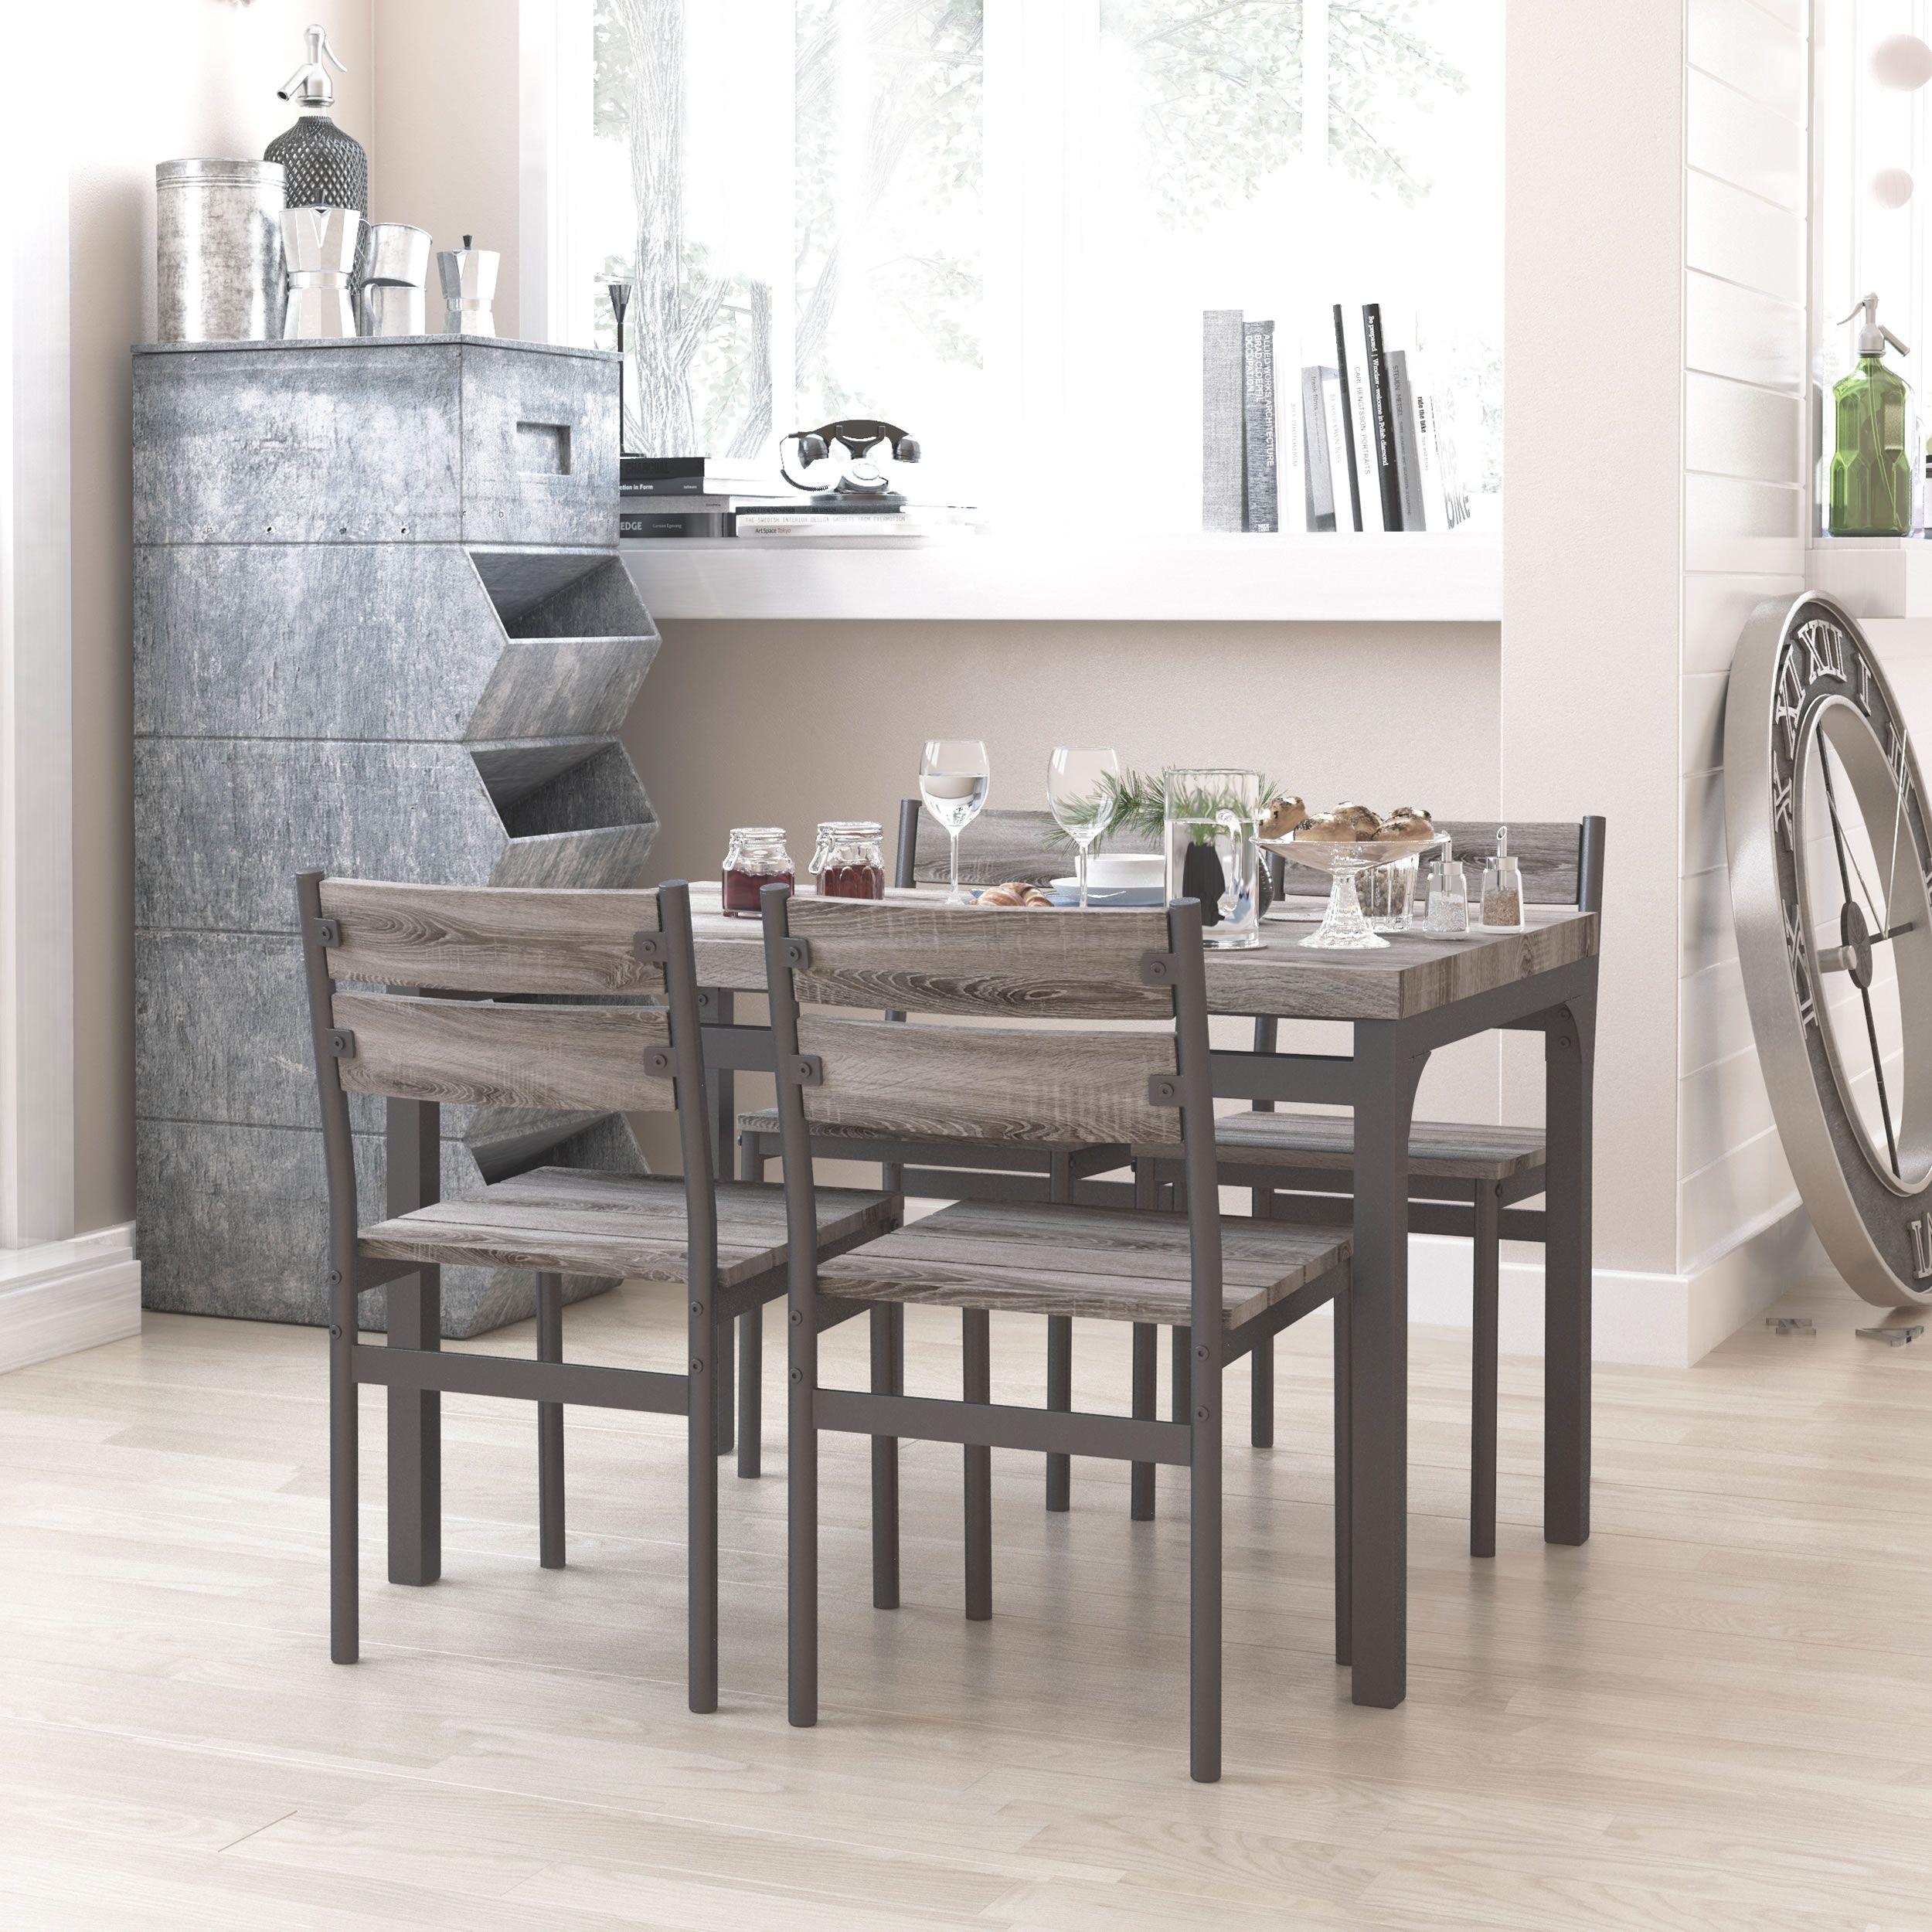 Zenvida 5 Piece Dining Set / Breakfast Nook, Table and 4 Chairs, Rustic Grey - Walmart.com in ...